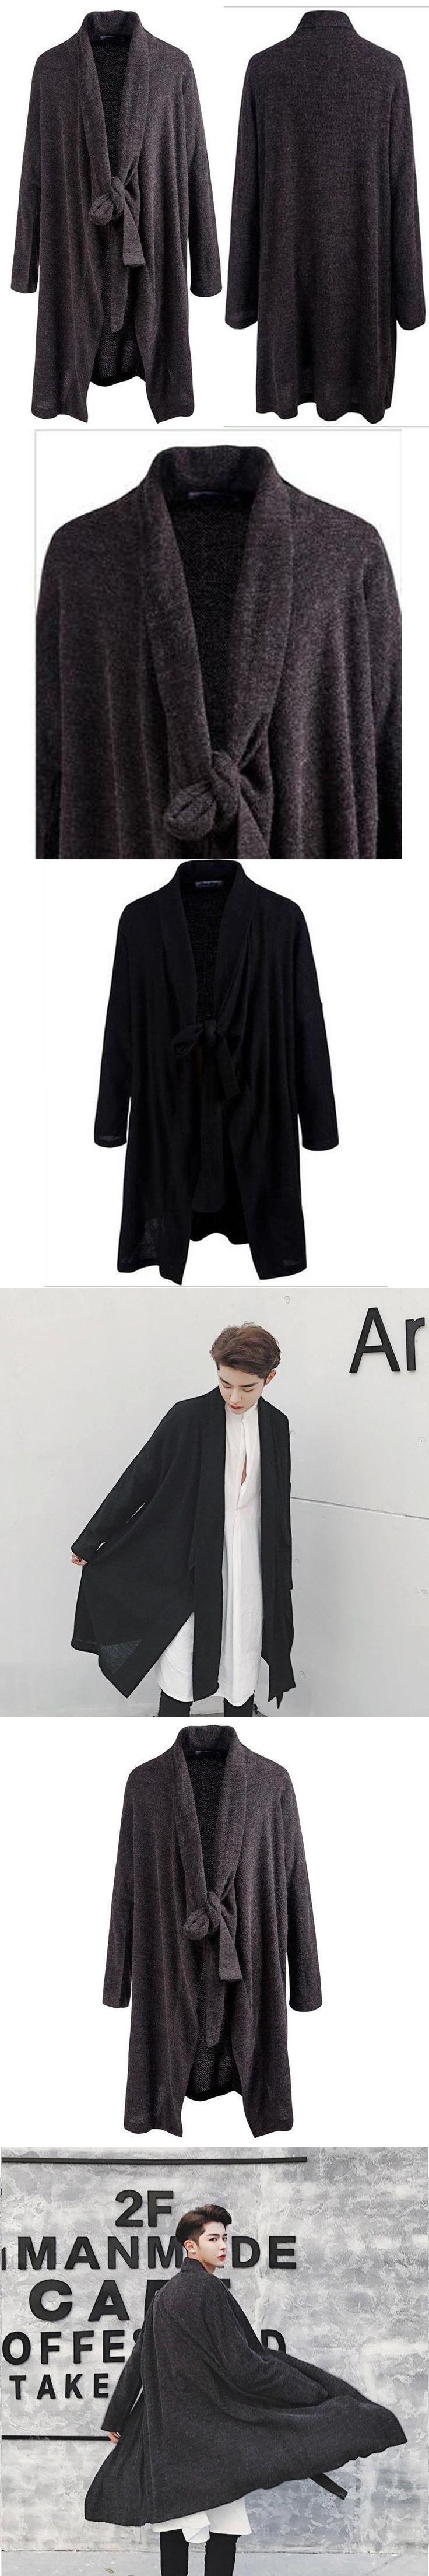 Trendy Men's Loose Black Gray Gothic Cape Avant-grade Rib Long Front Trench Drape Cardigan Mens Cotton Linen Thin Dust Coat Tops